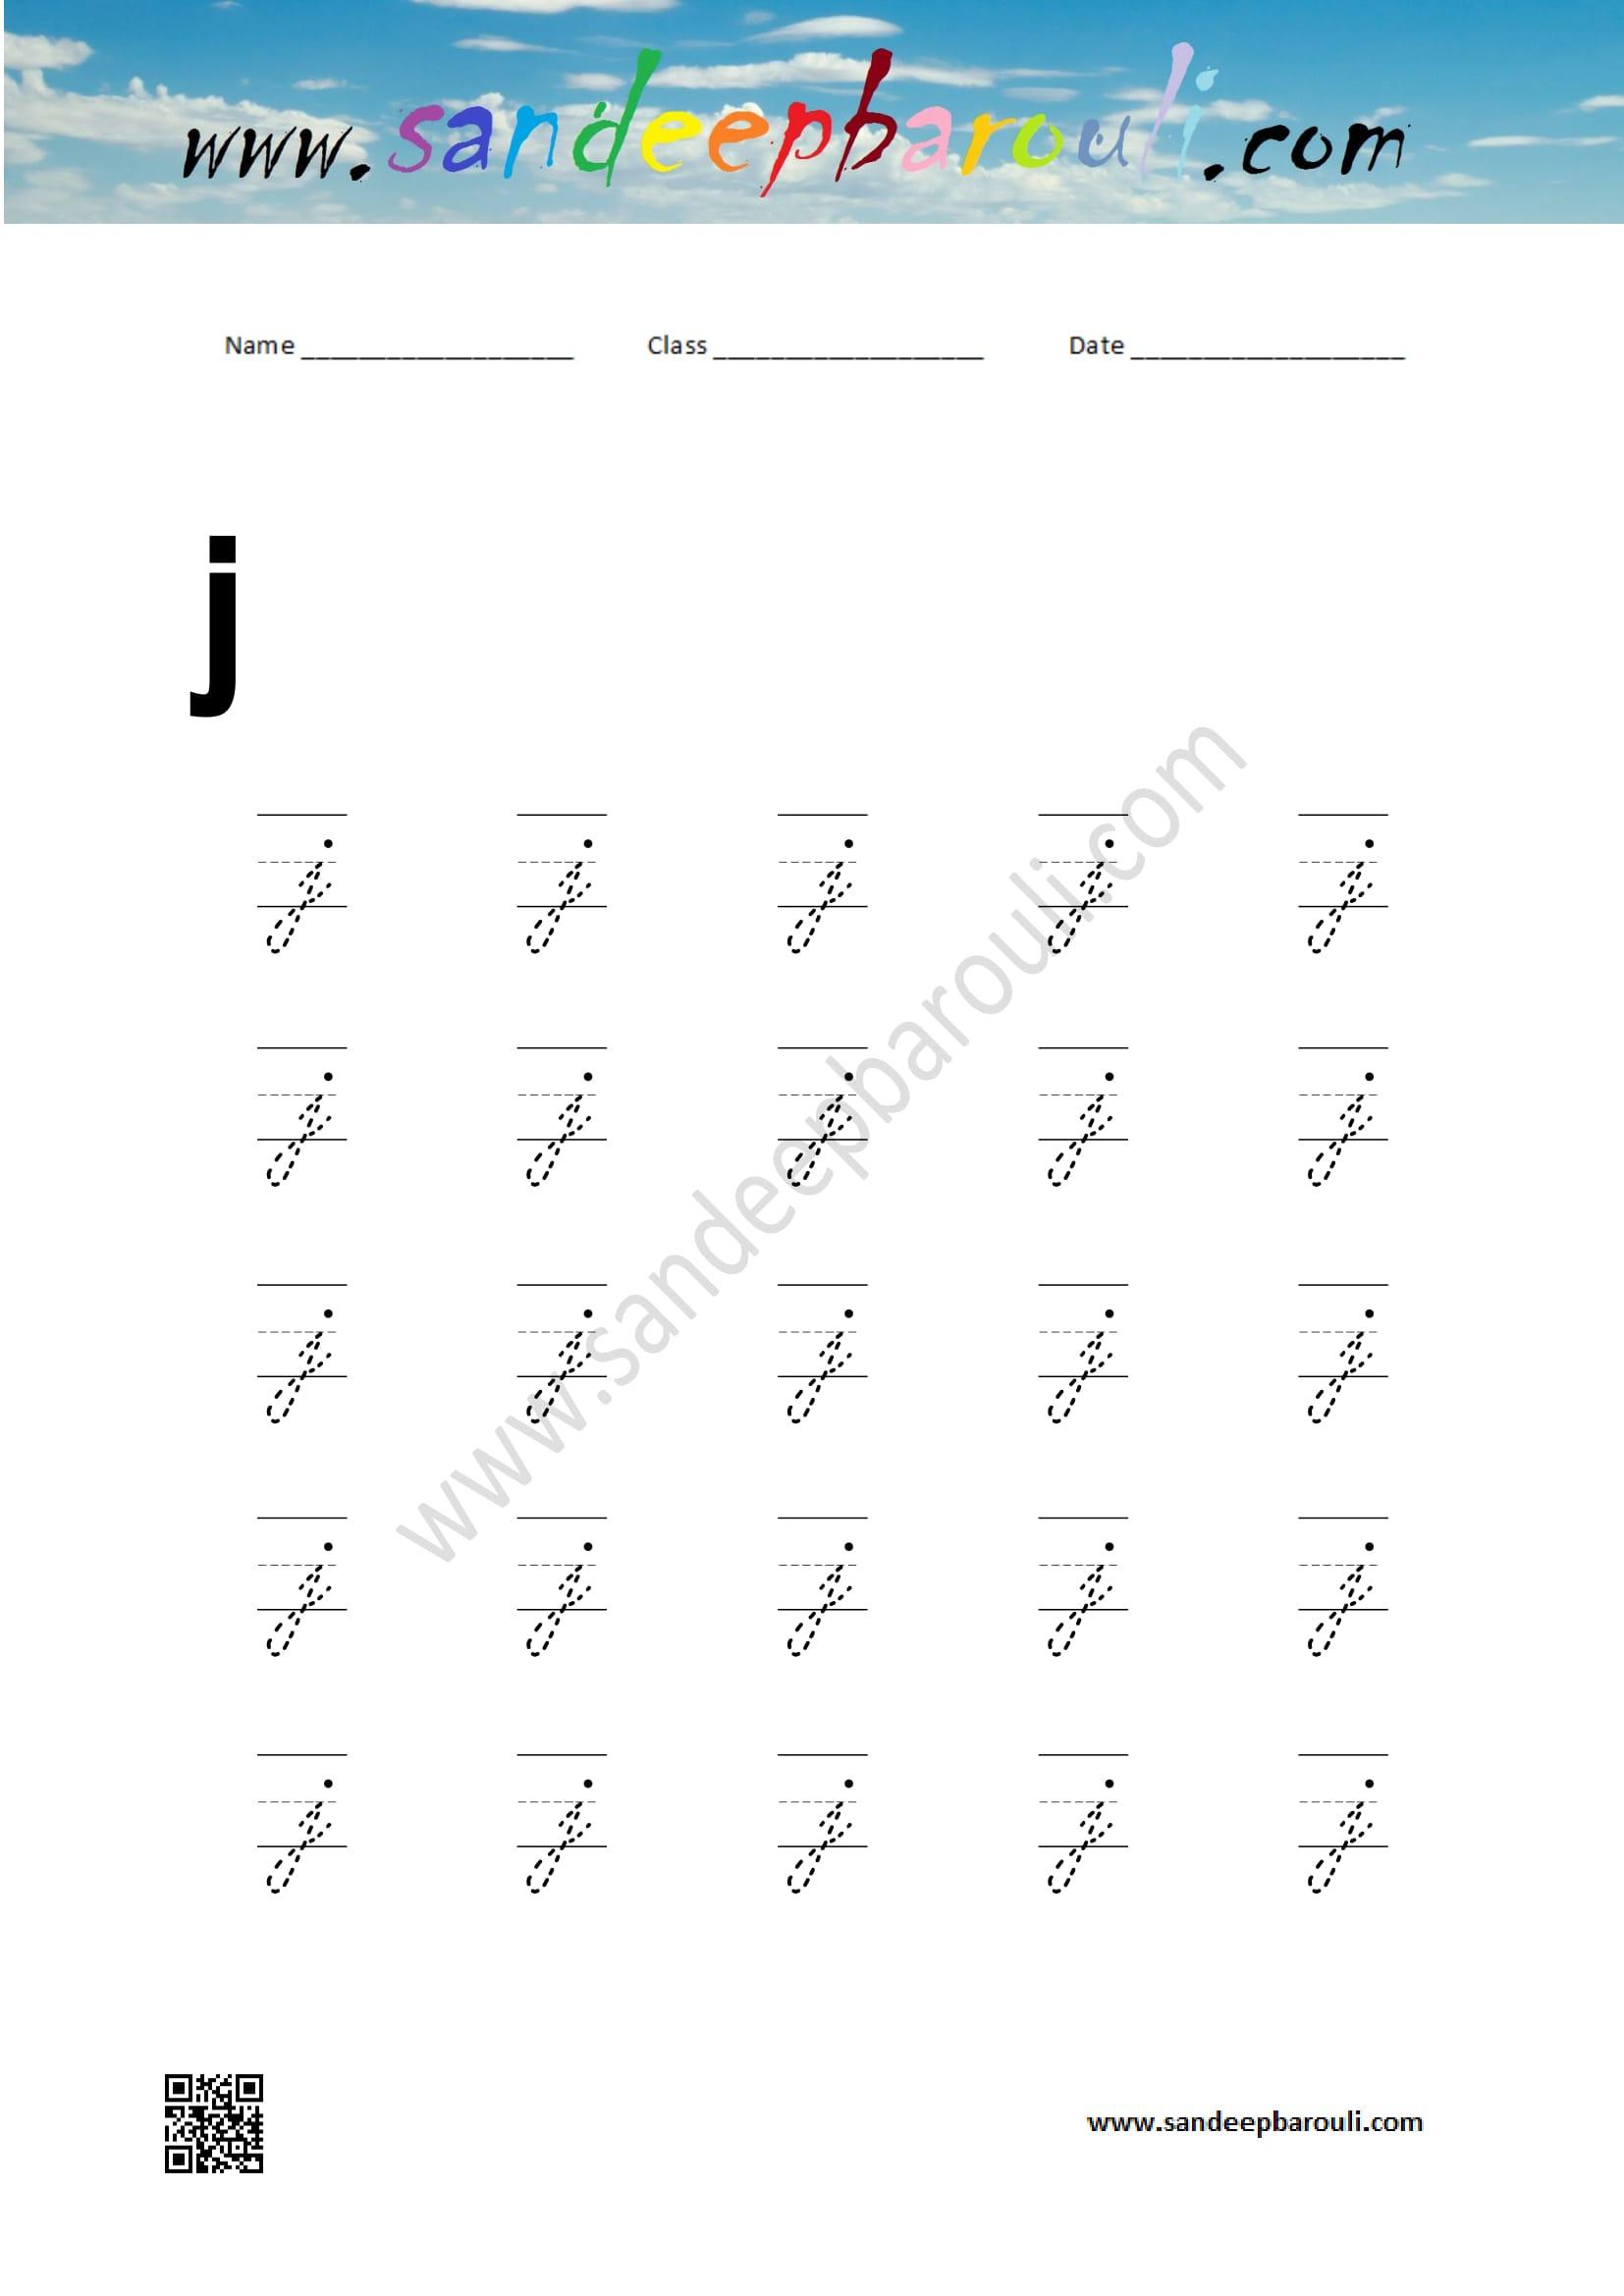 cursive writing worksheet for small letters j sandeepbarouli